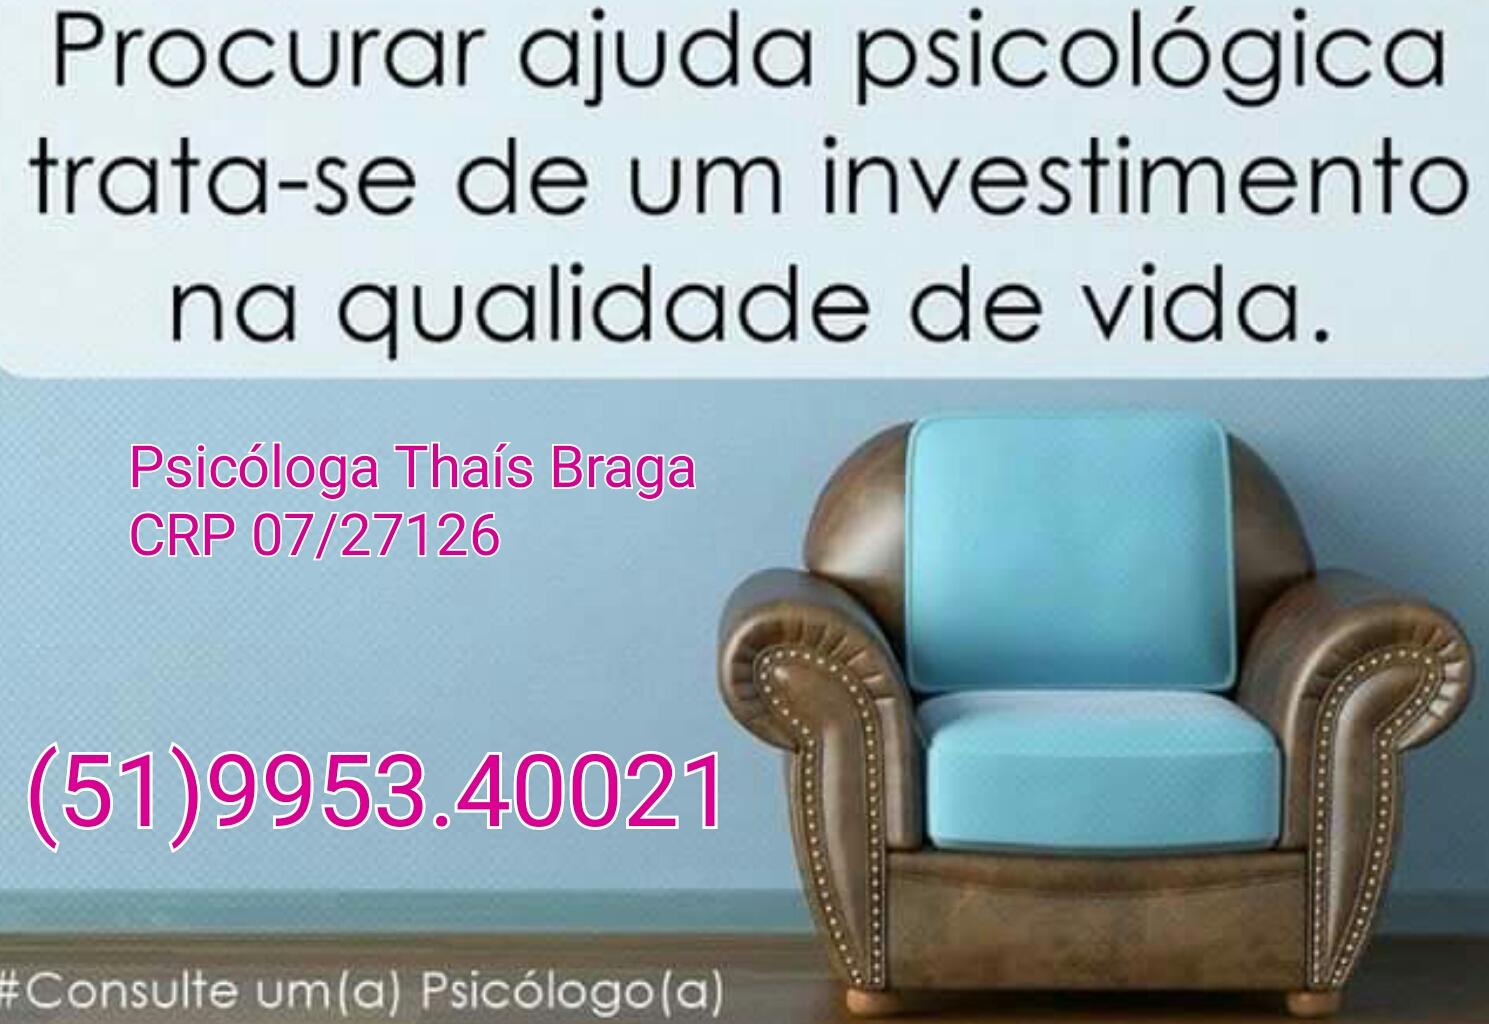 Photogrid 1492203626539